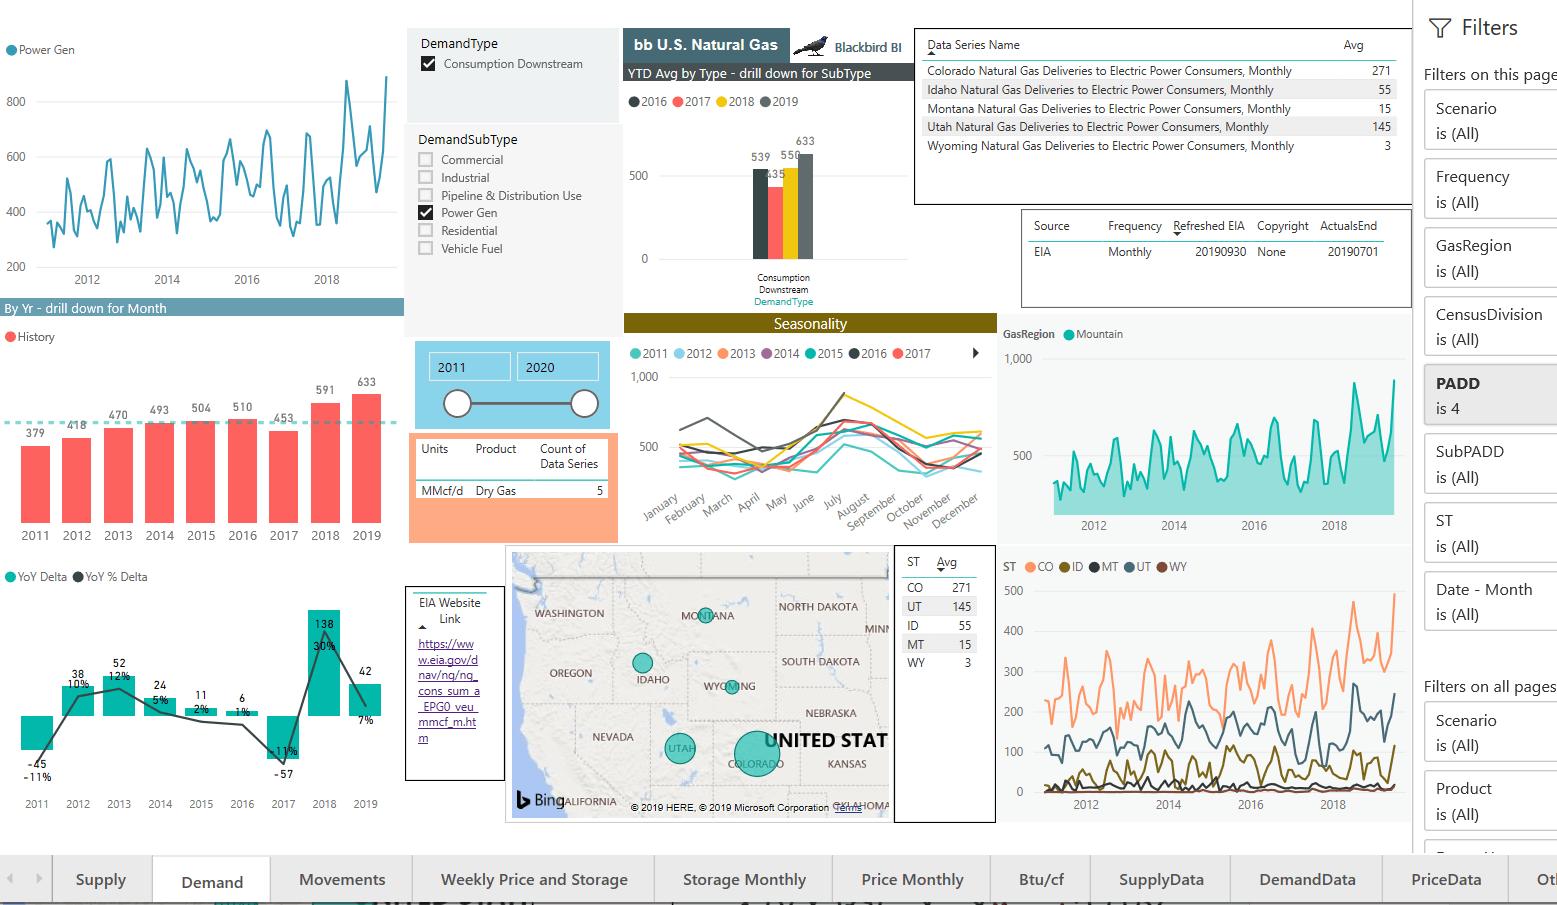 Image of Blackbird BI data dashboard